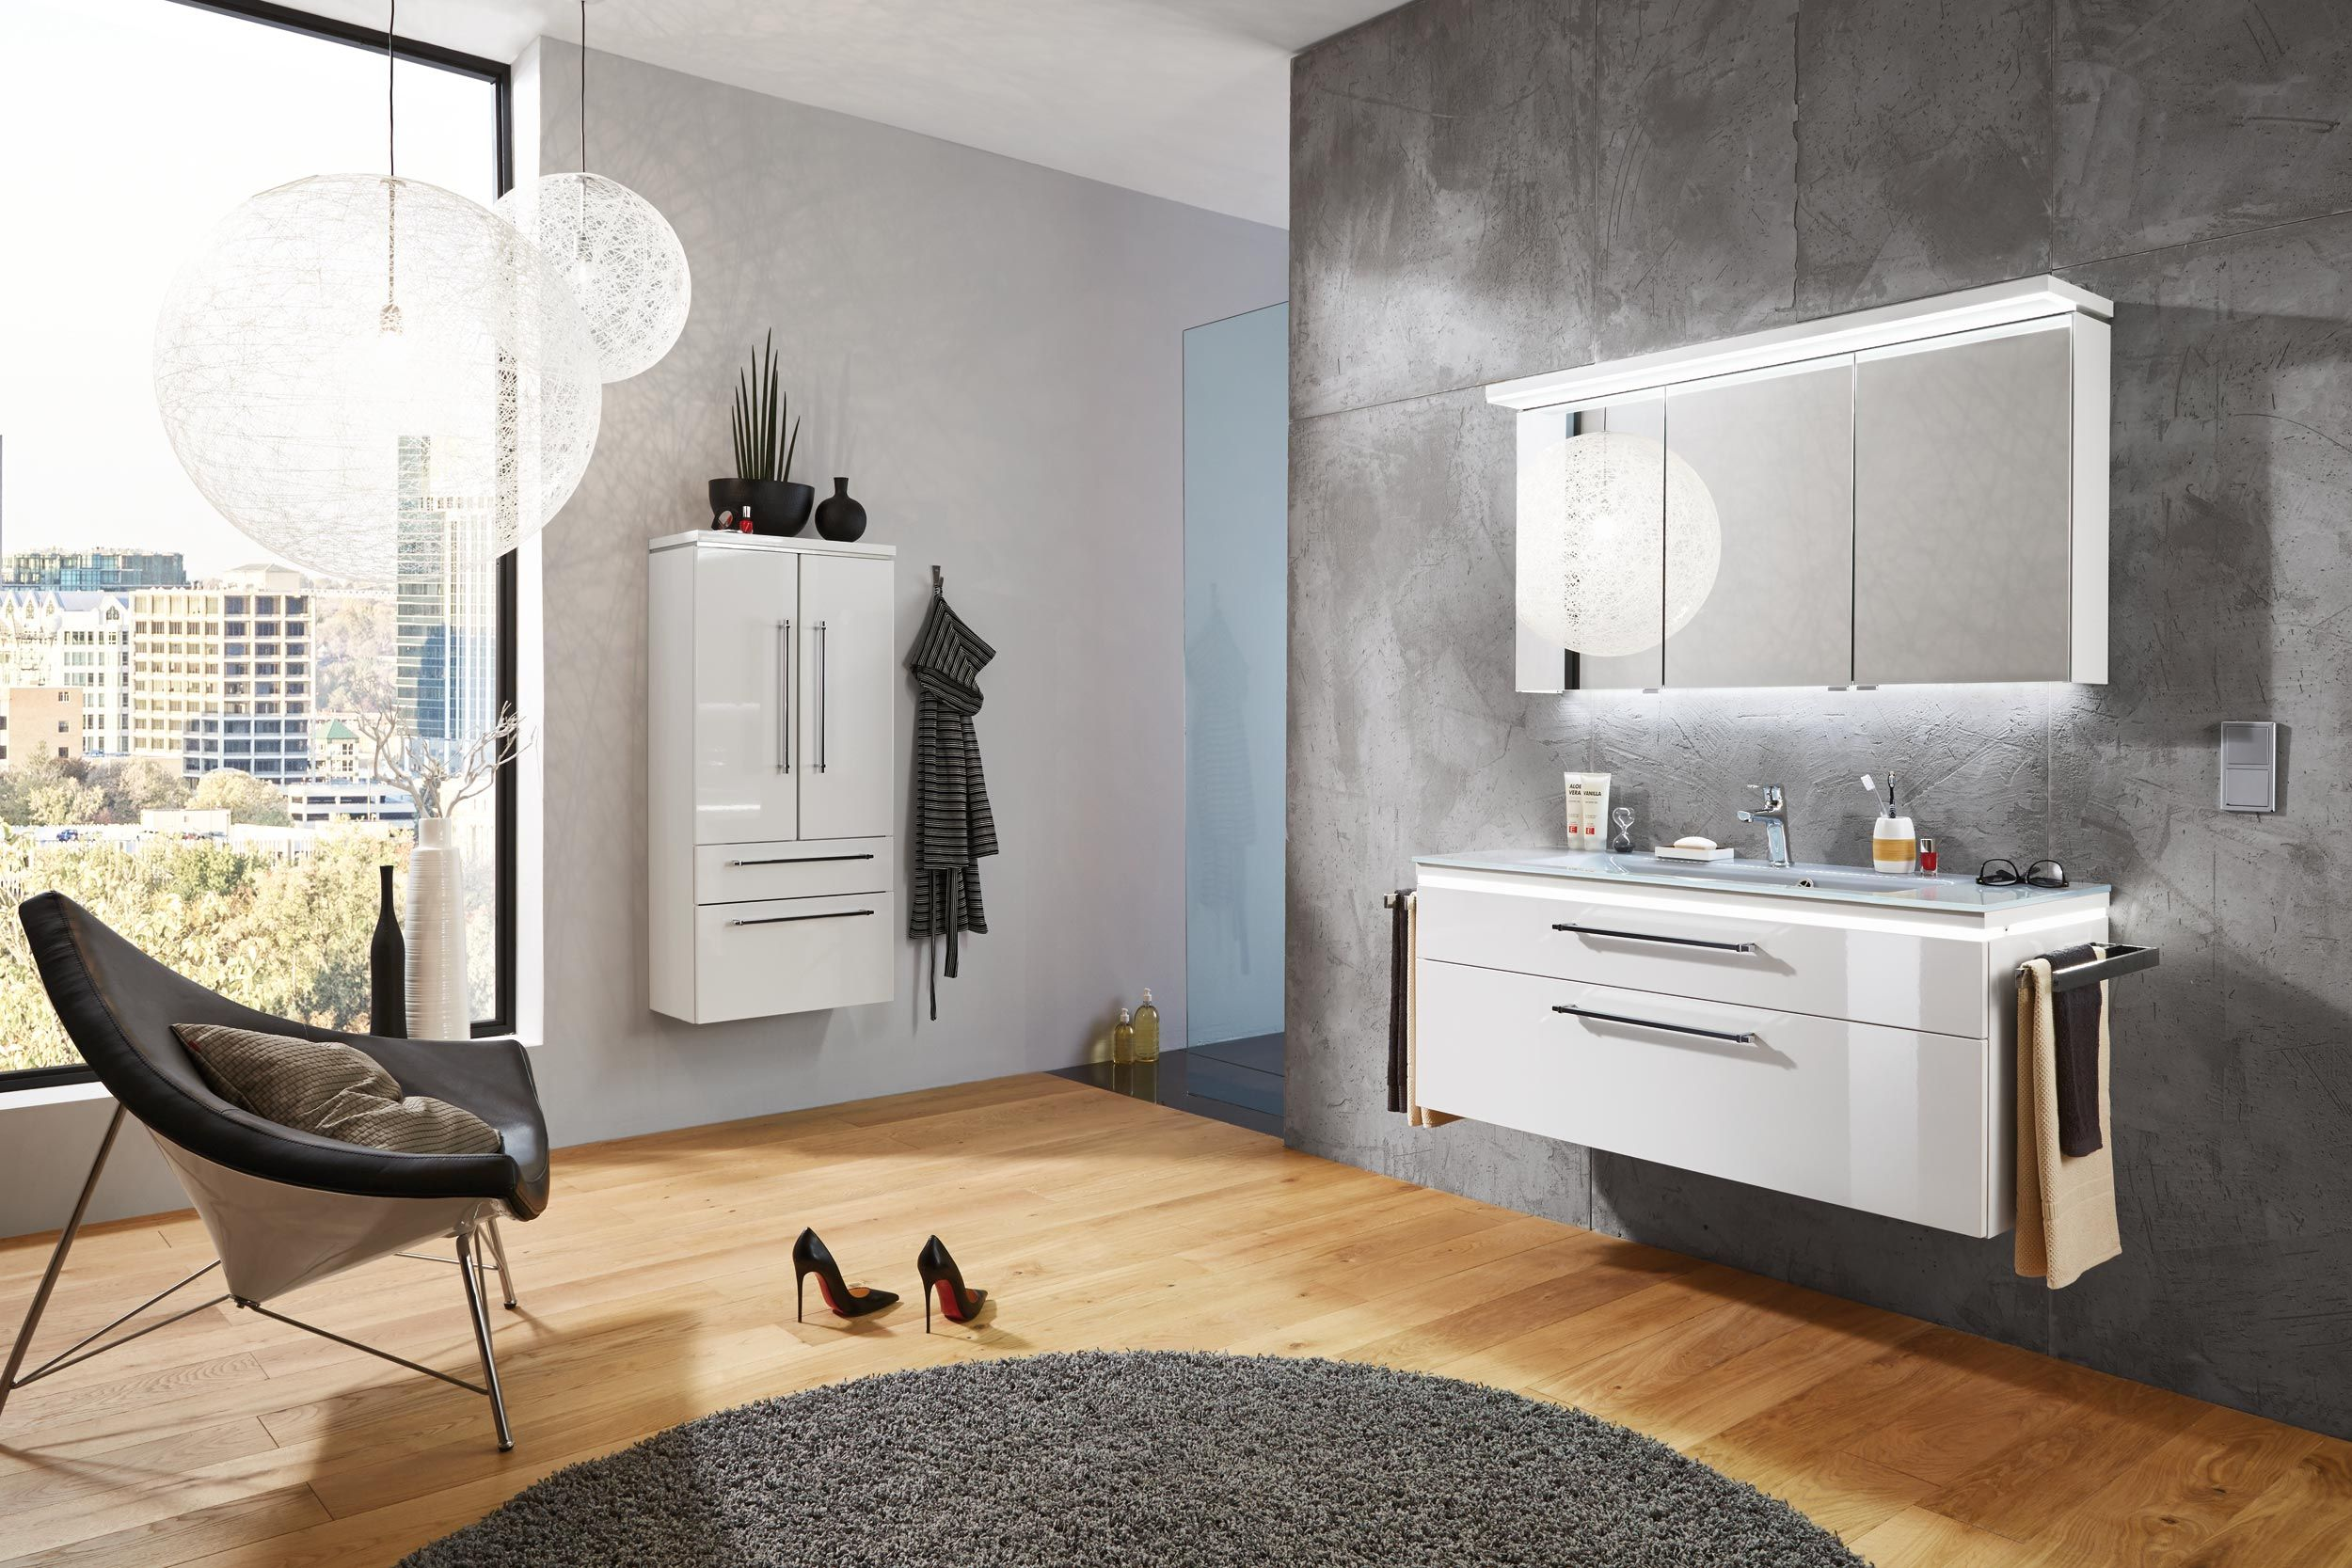 Ikea Dijon Salle De Bain ~ Meuble De Salle De Bain Cedam Gamme Cool Line Mod Le Pur Aux